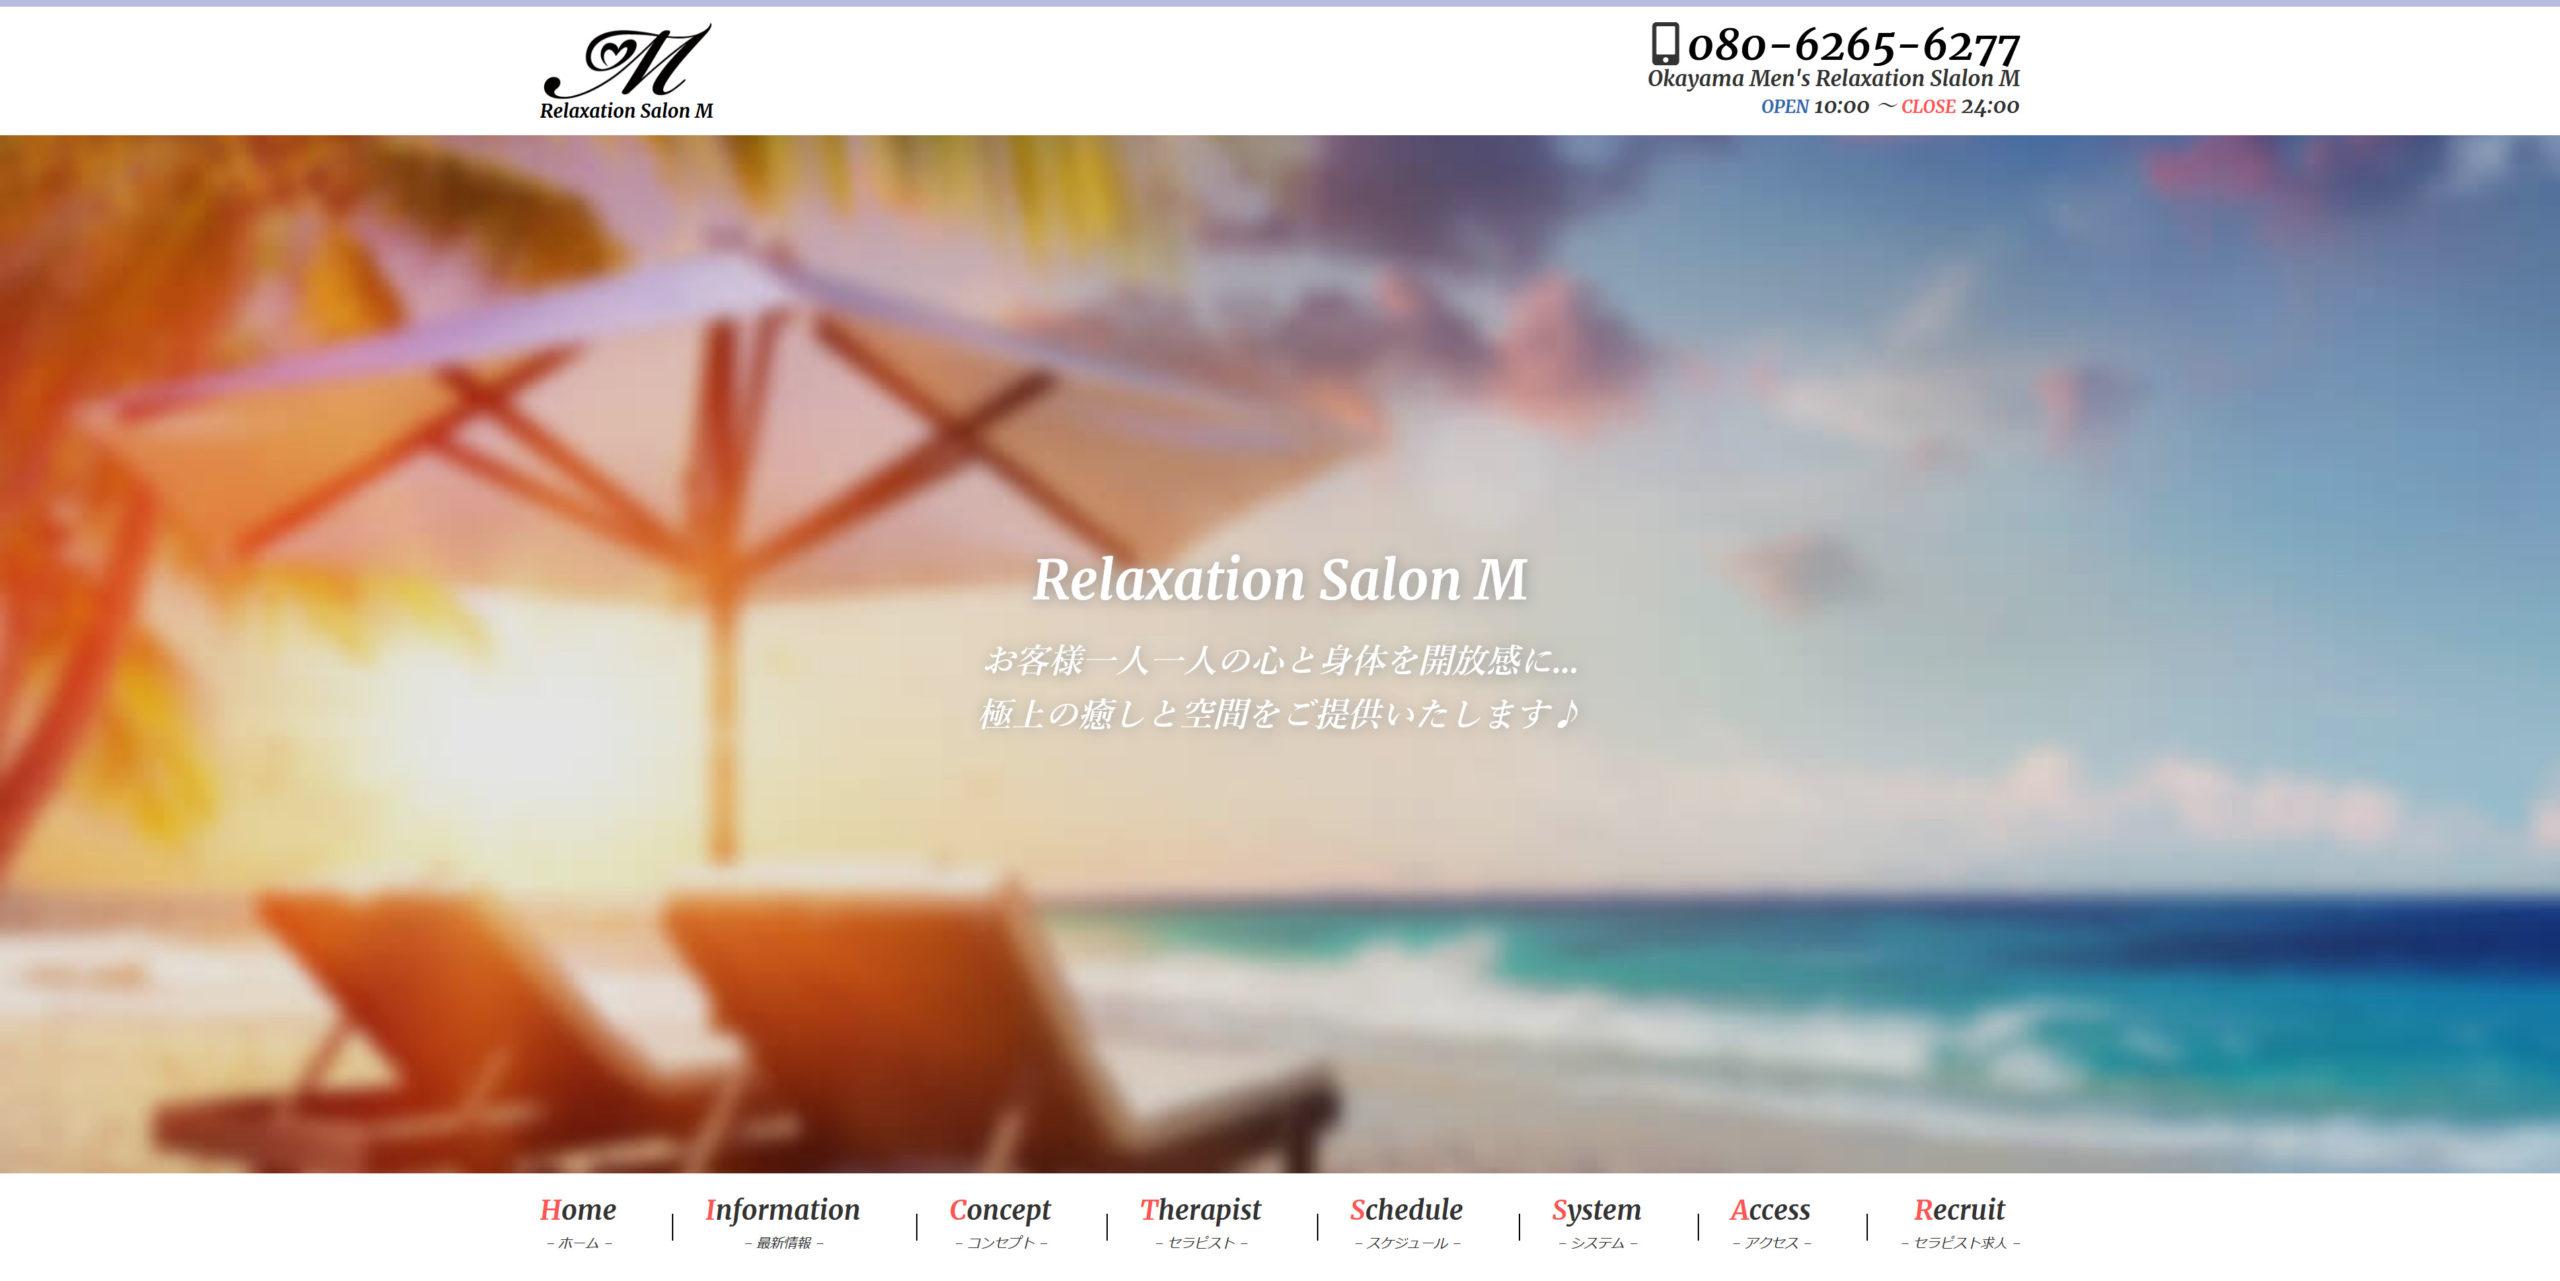 Relaxation Salon M (エム)